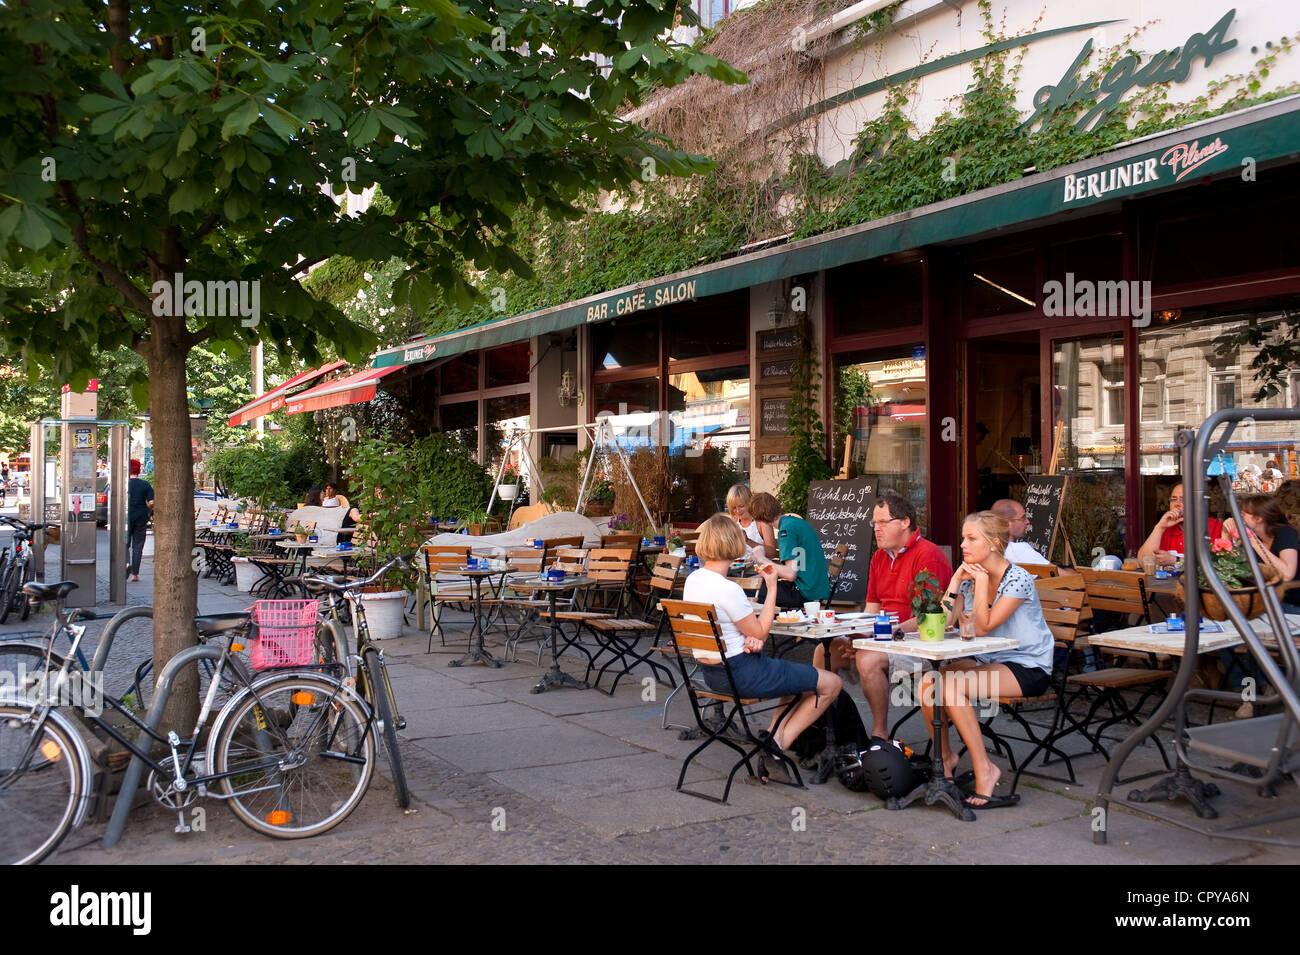 germany berlin prenzlauer berg district kastanienllee cafe stock photo 48543901 alamy. Black Bedroom Furniture Sets. Home Design Ideas